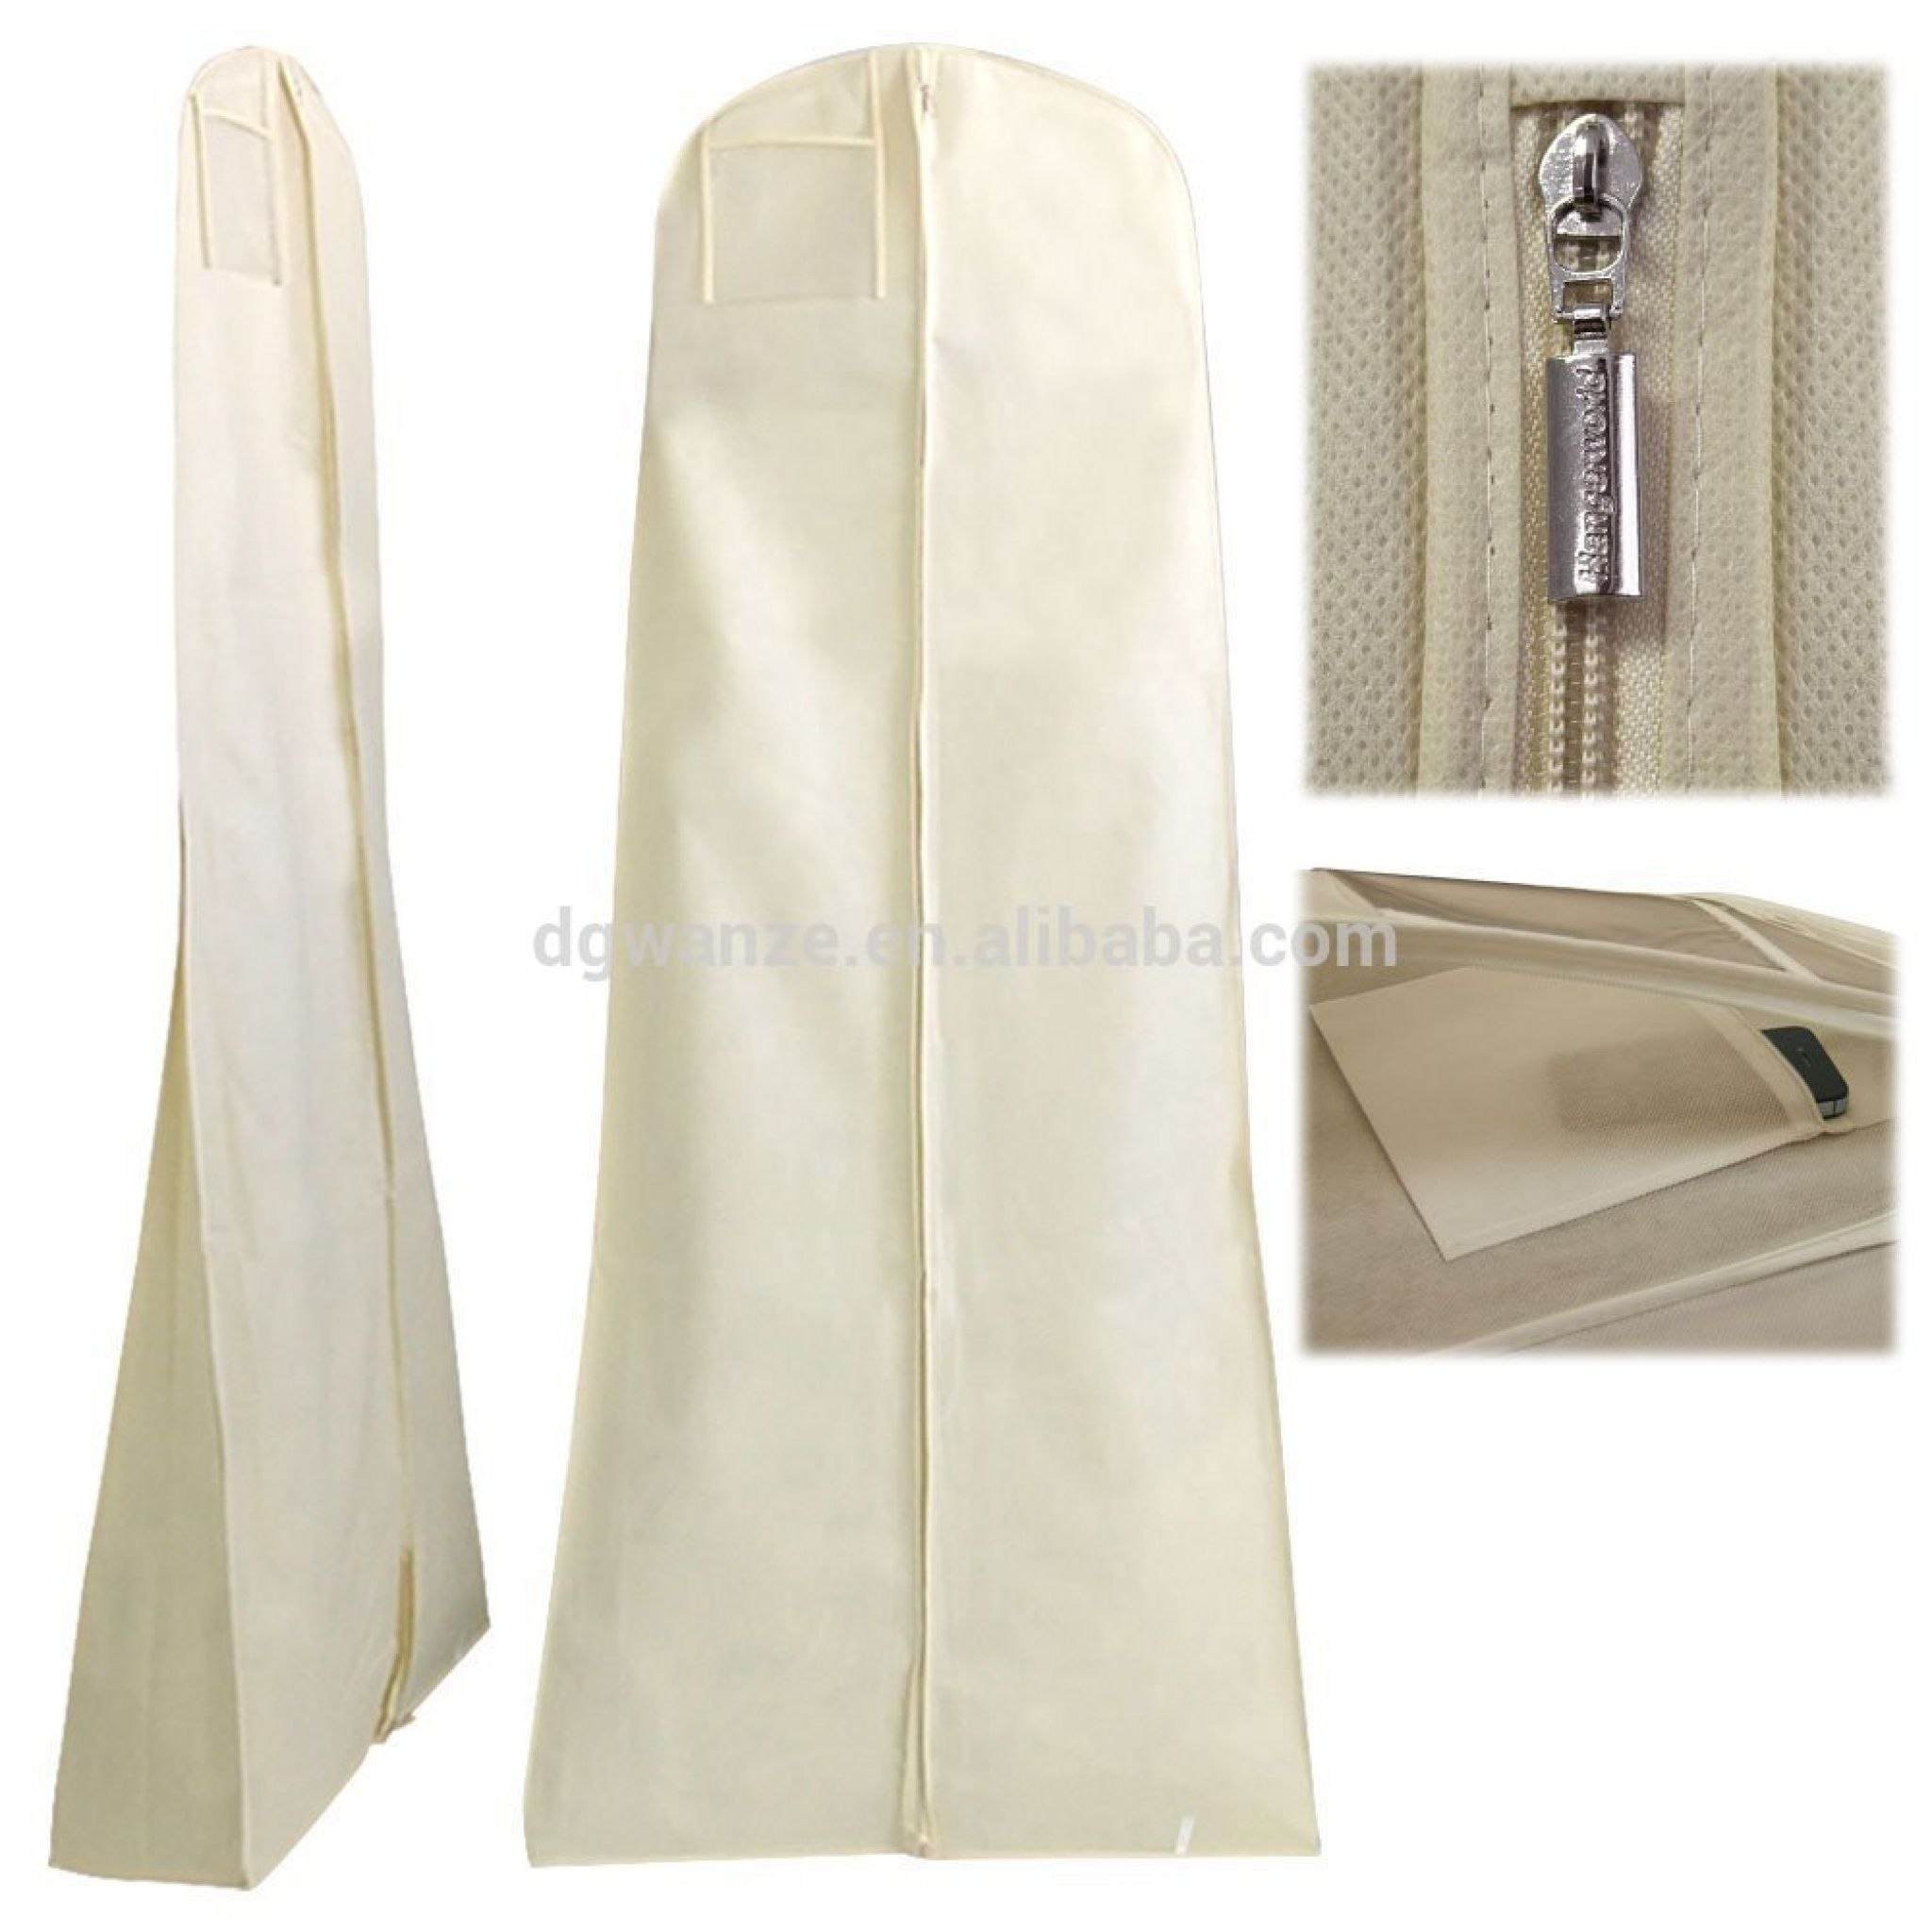 Garment Bag For Wedding Dress Cute Dresses For A Wedding Gowns Dresses Wedding Gown Storage Gown Wedding Dress